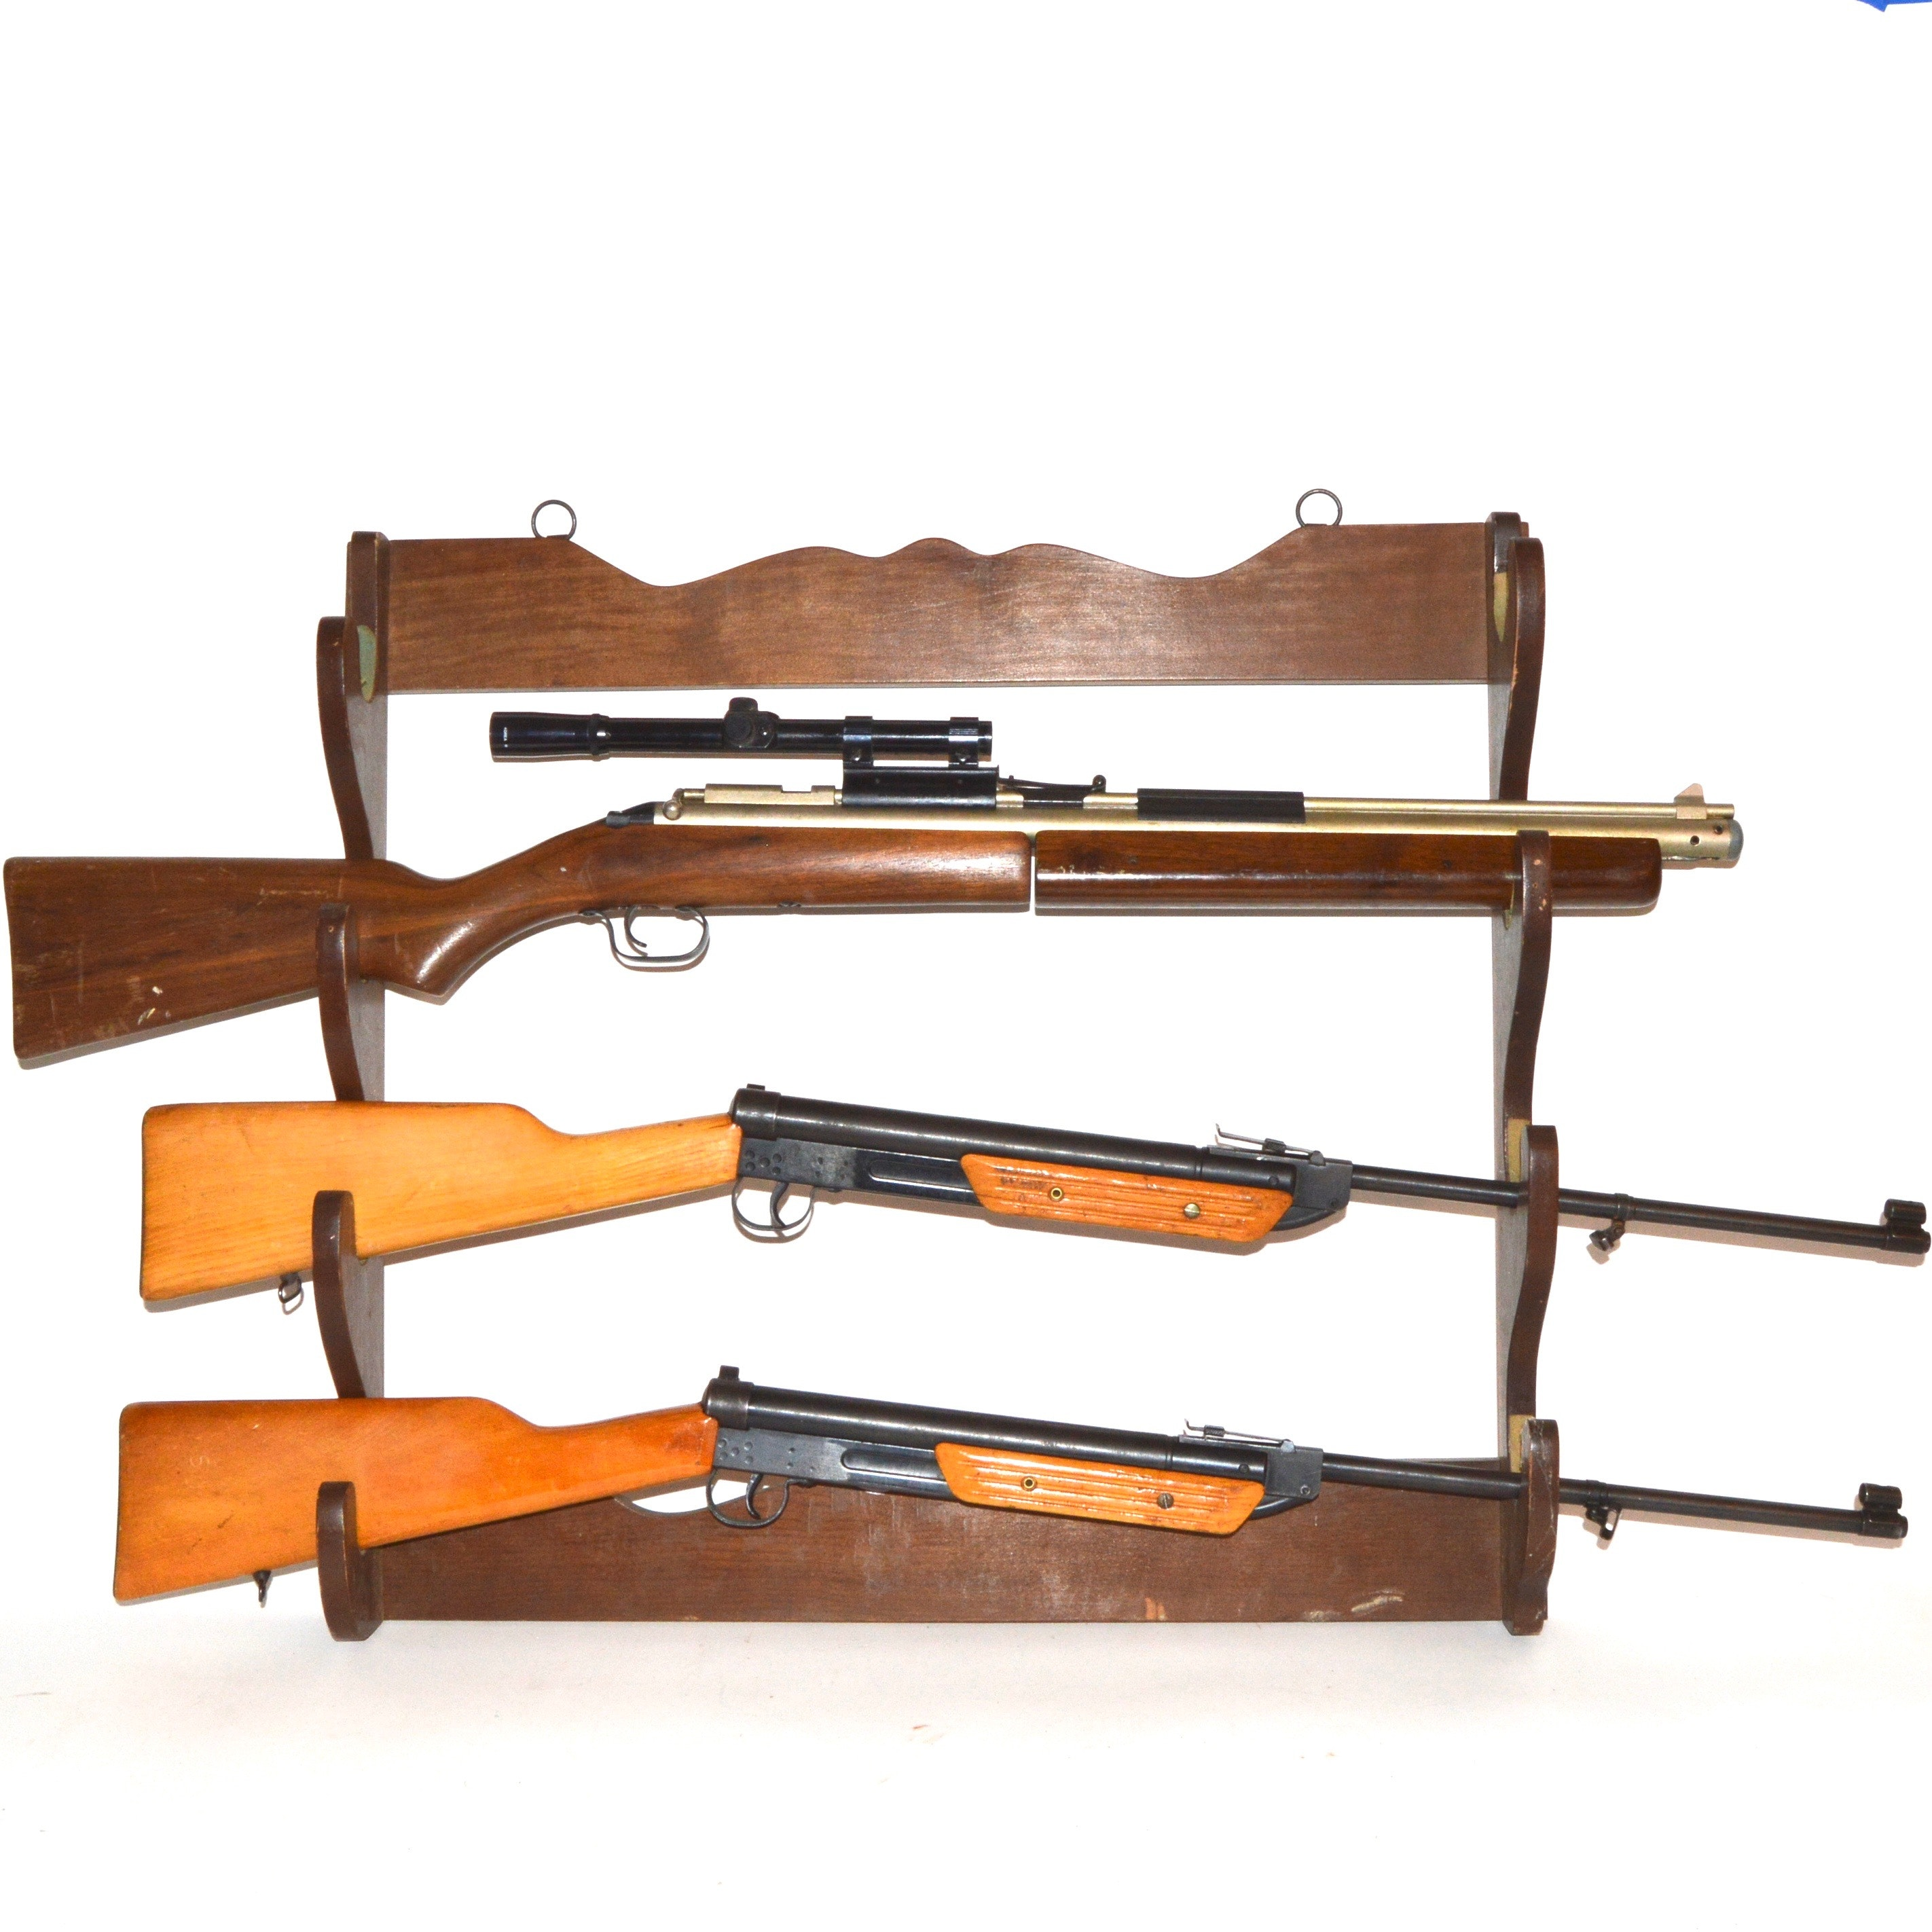 Three BB and Air Gun Rifles with Wooden Rifle Rack